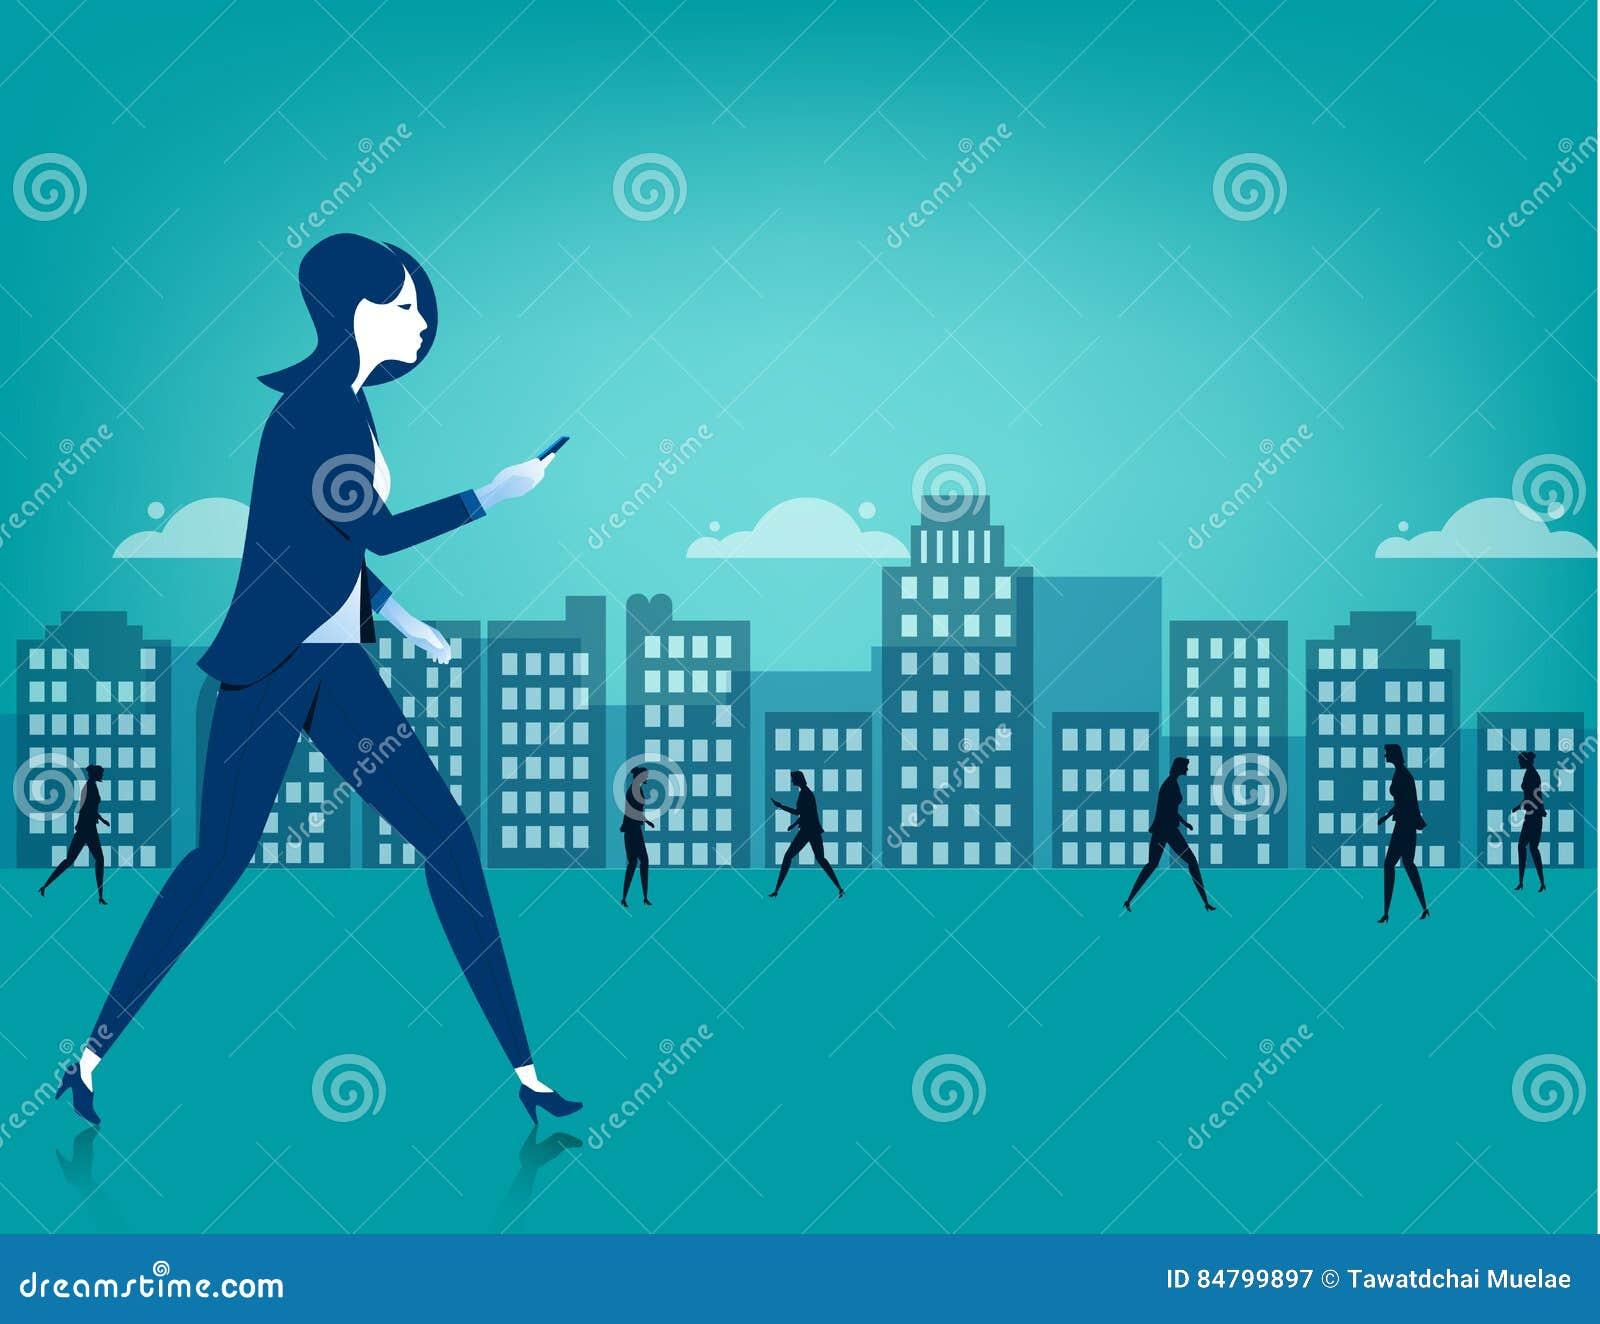 Businesswoman walking on city using a smart phone